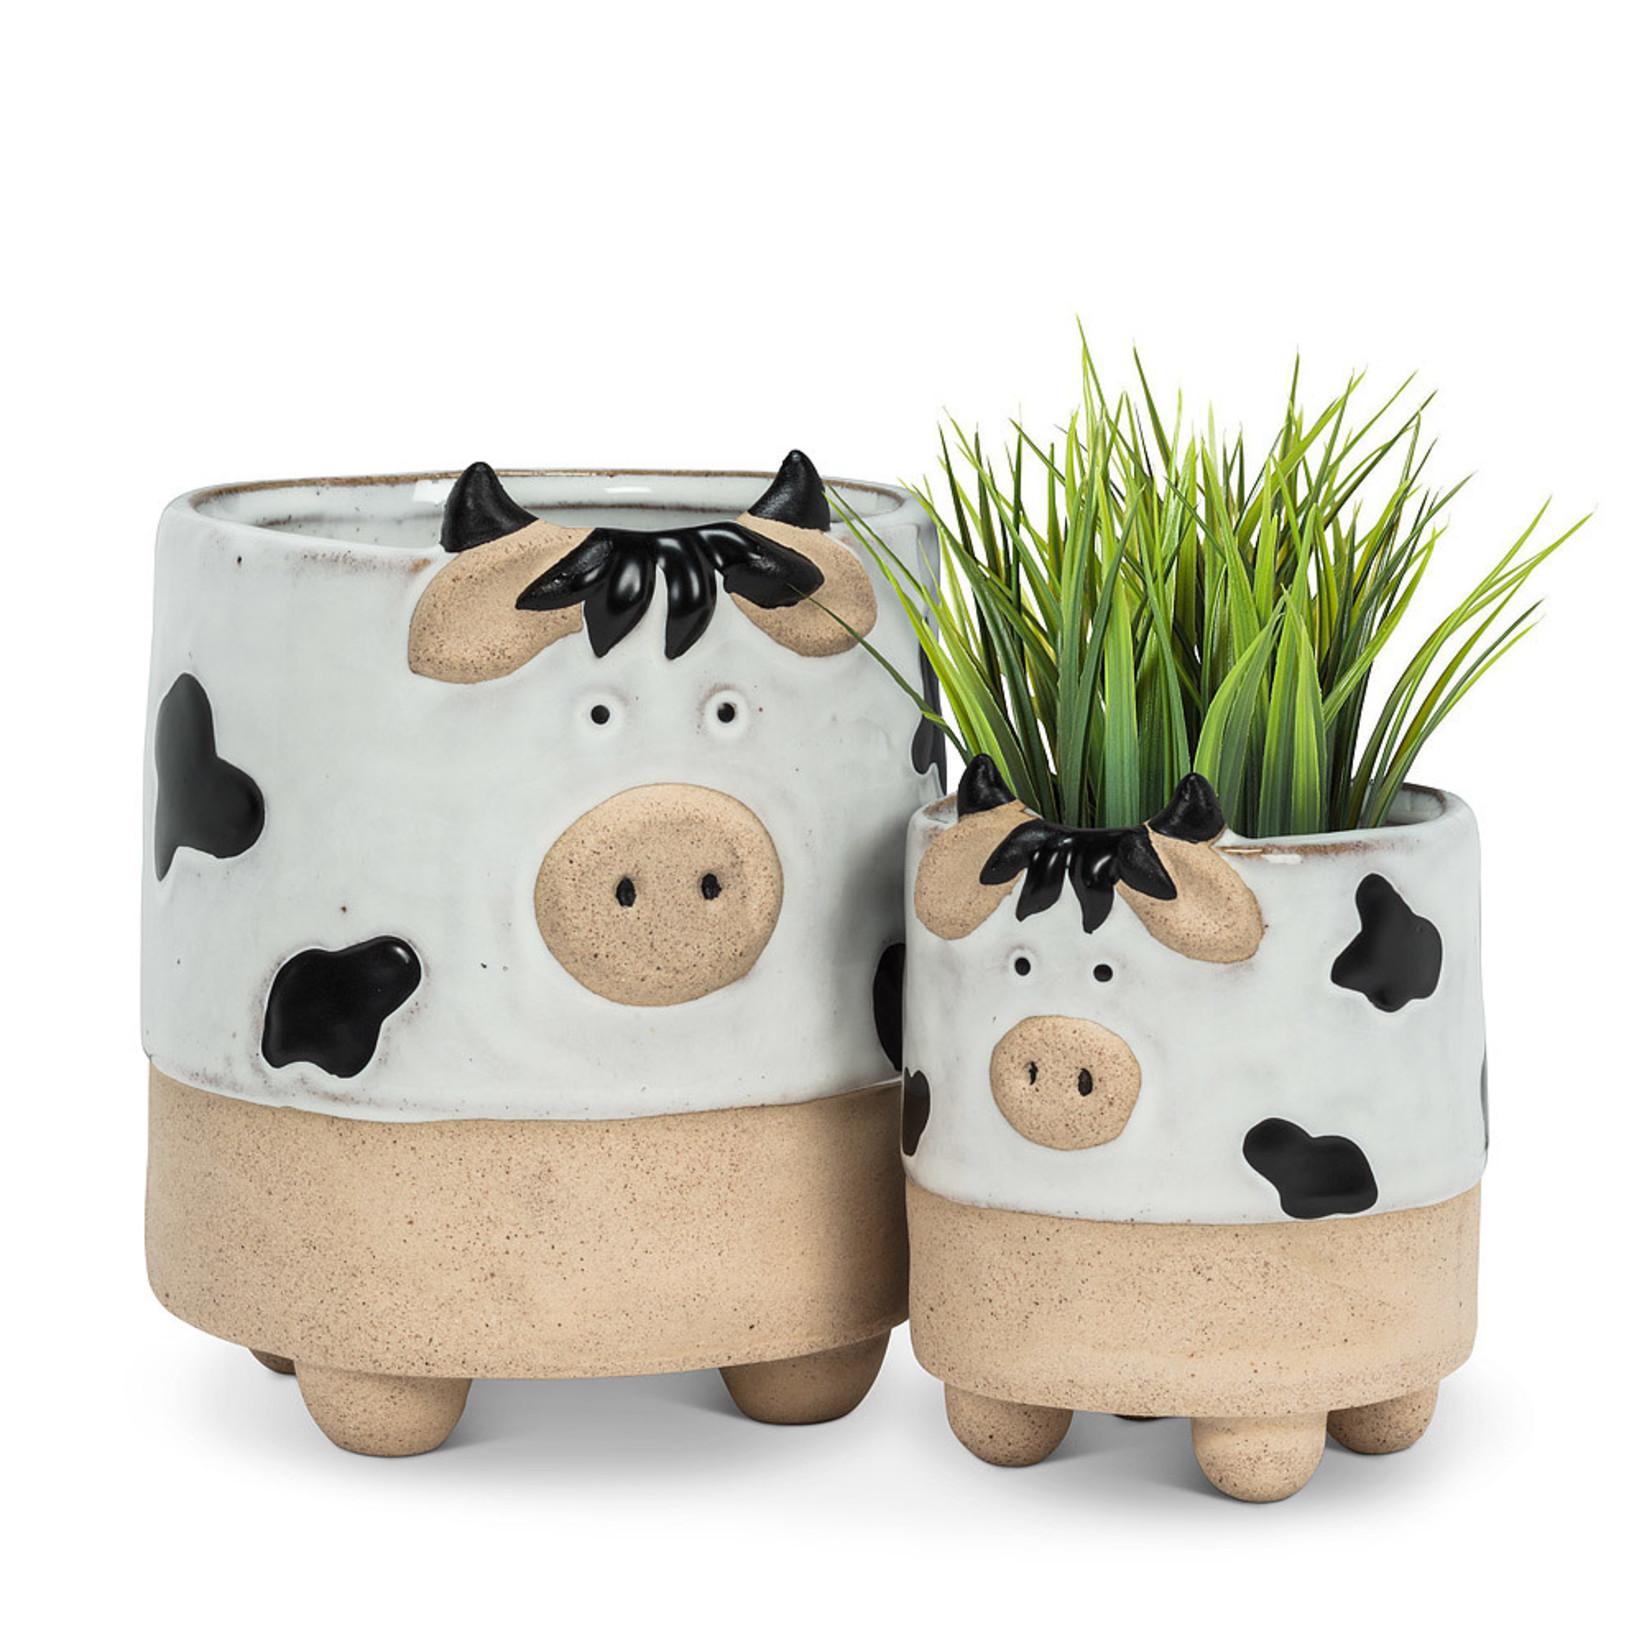 Planter - Cow on Legs LG